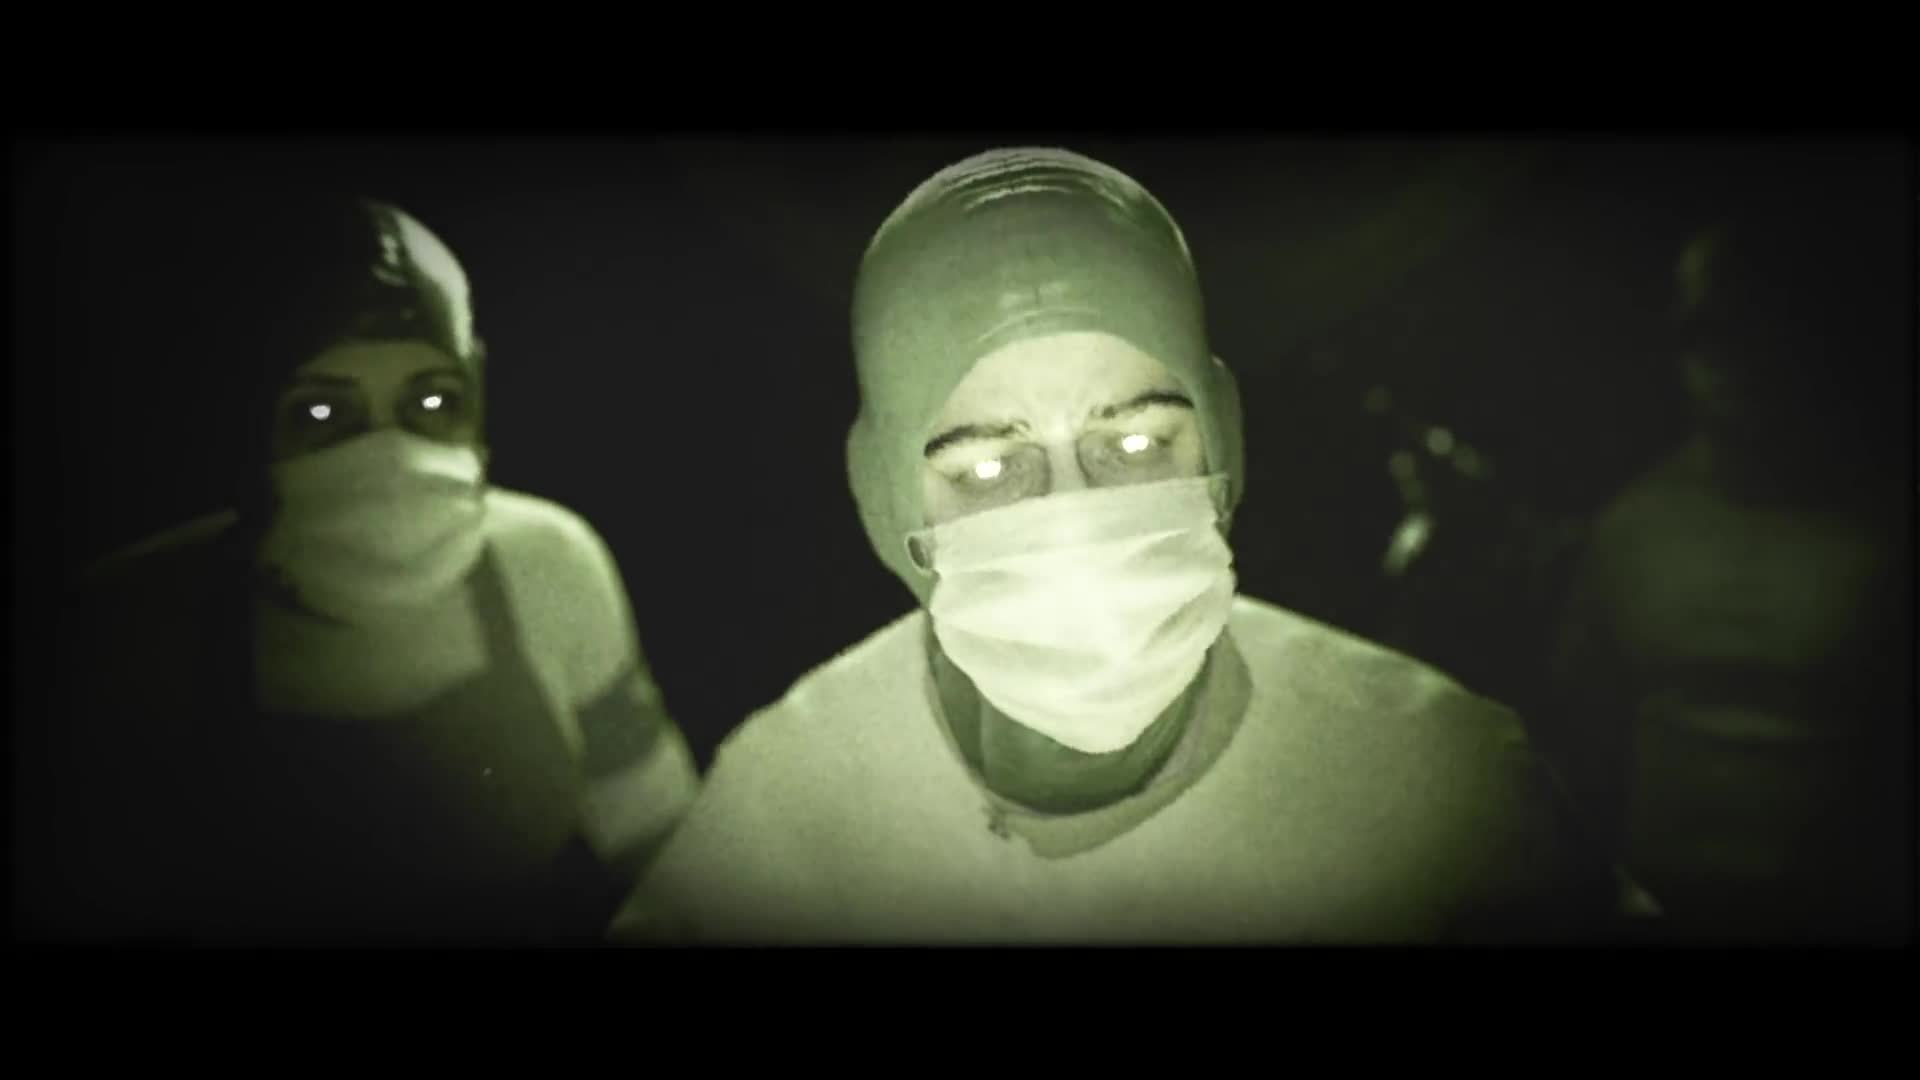 Trailer, Teaser, Horror, Survival Horror, Outlast, Red Barrels, The Outlast Trials